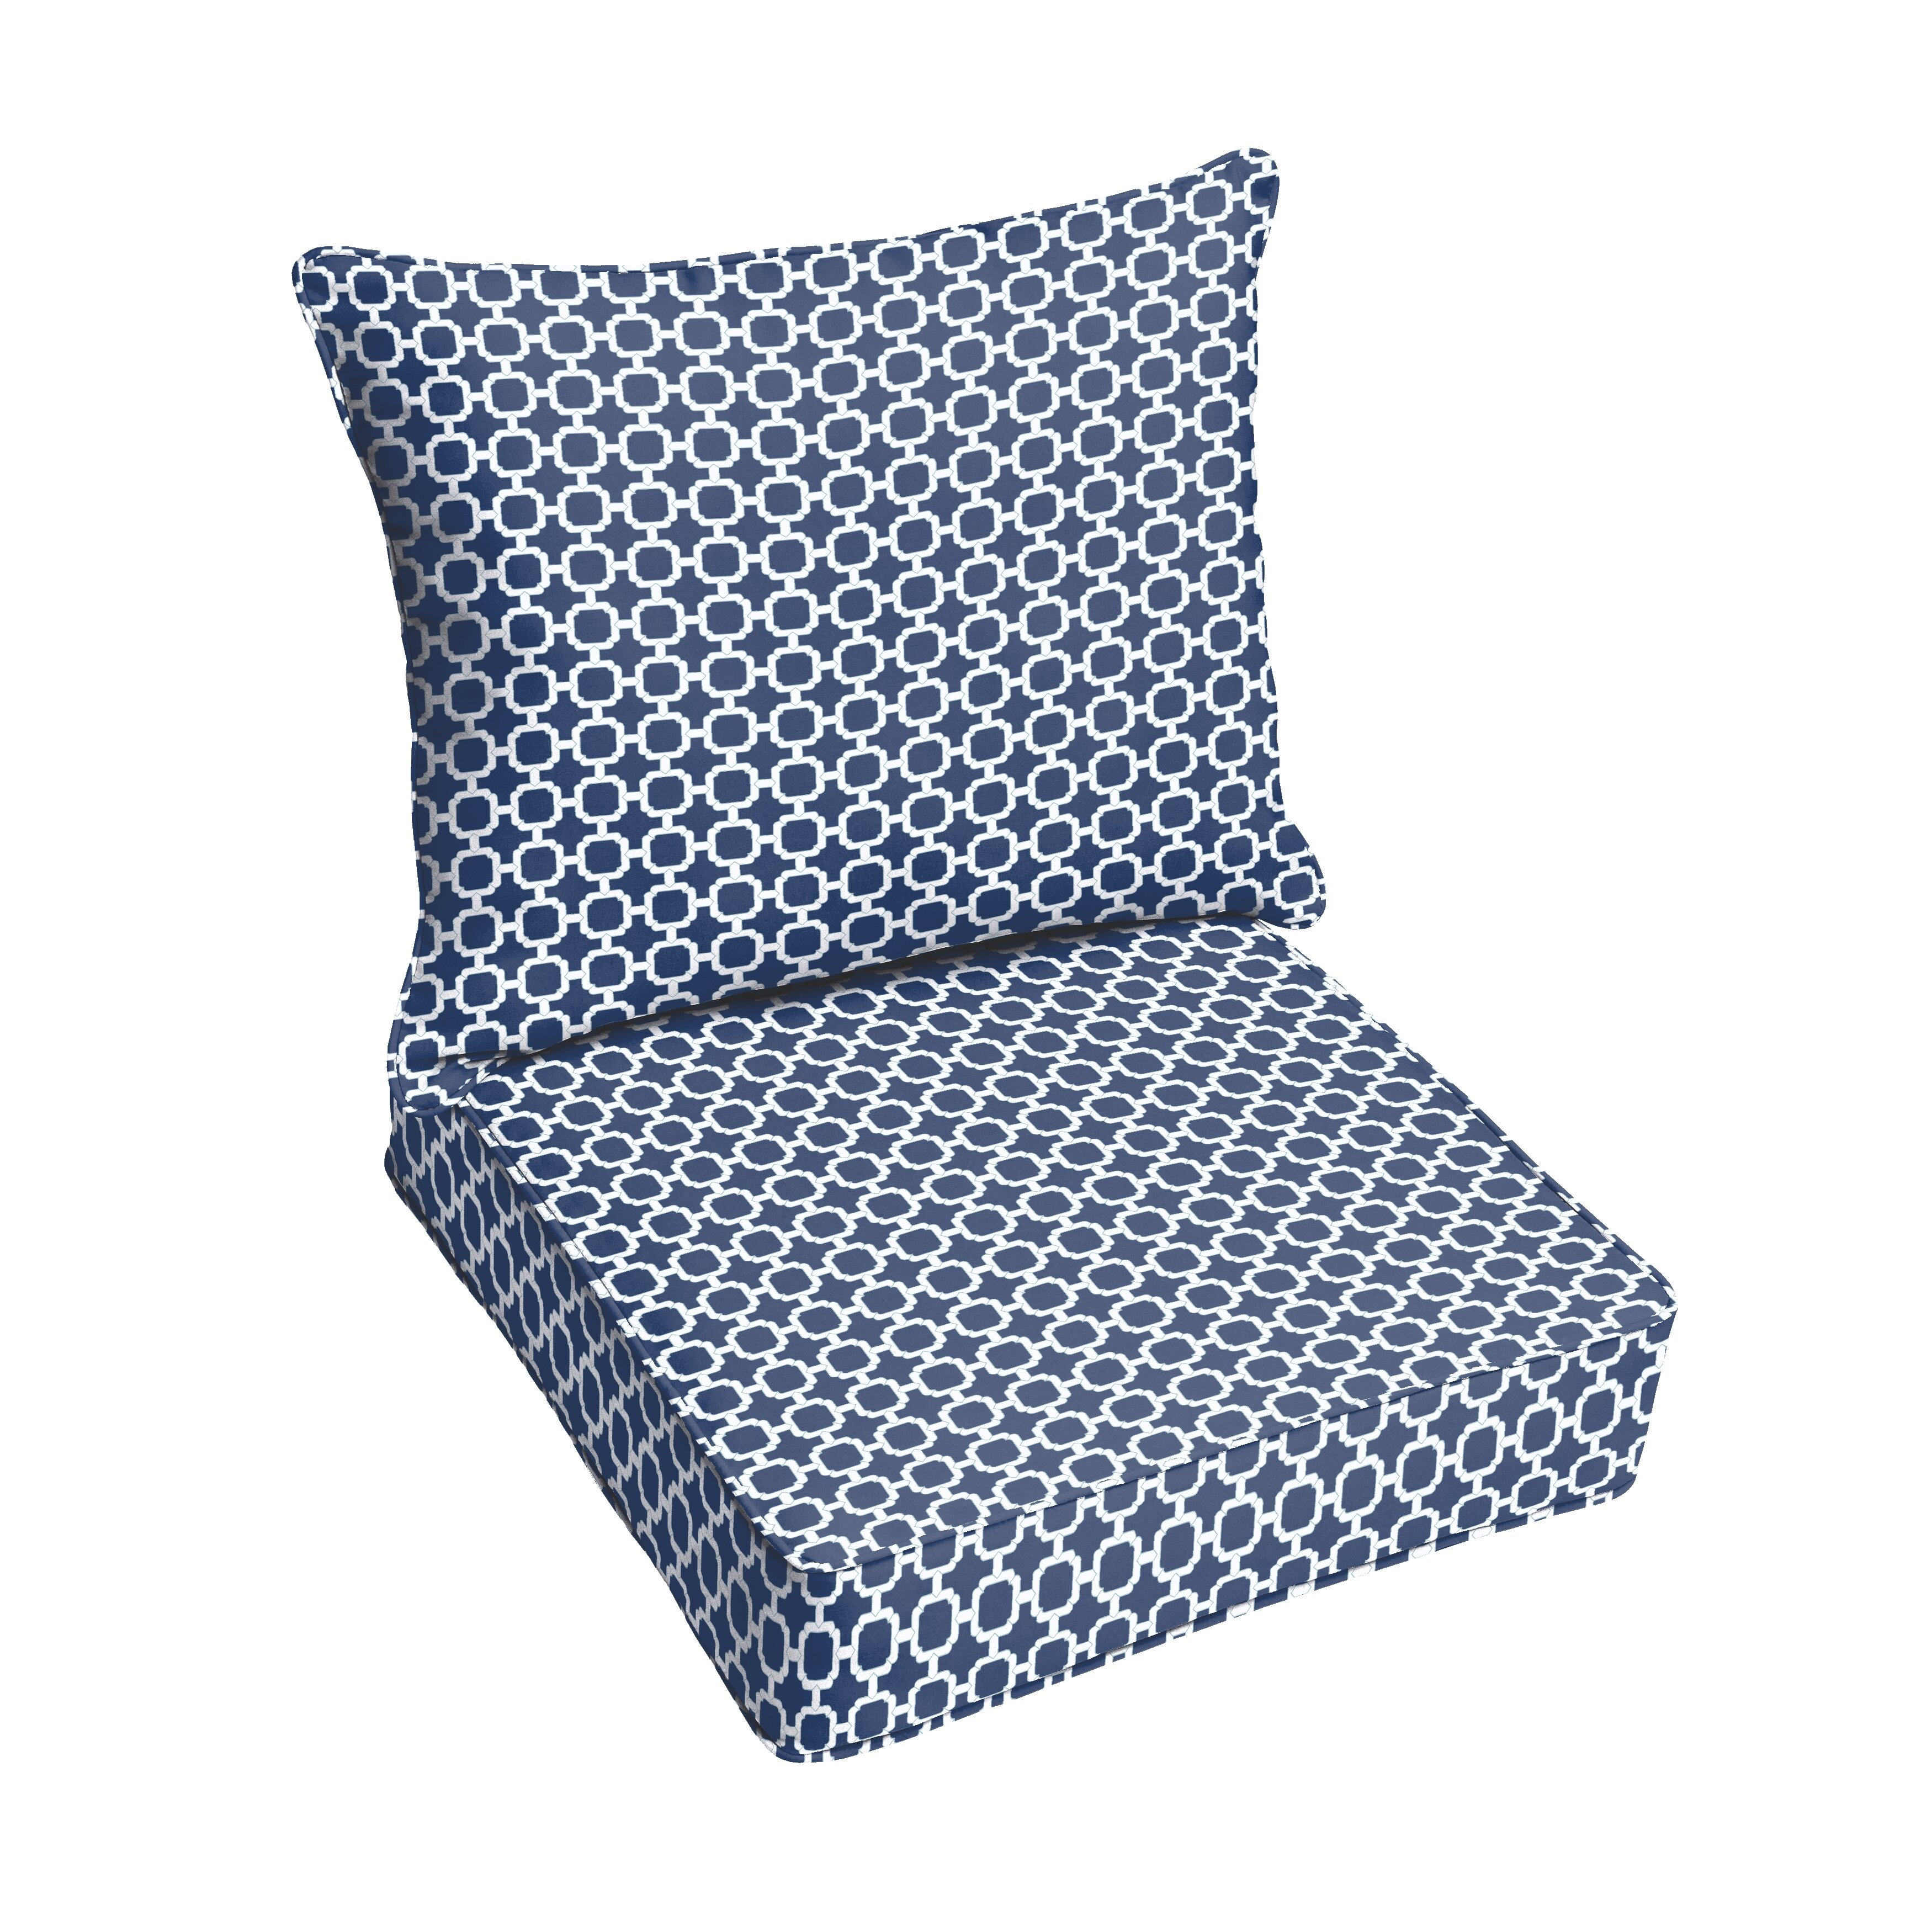 Breakwater Bay Hallsboro Outdoor Lounge Chair Cushion & Reviews